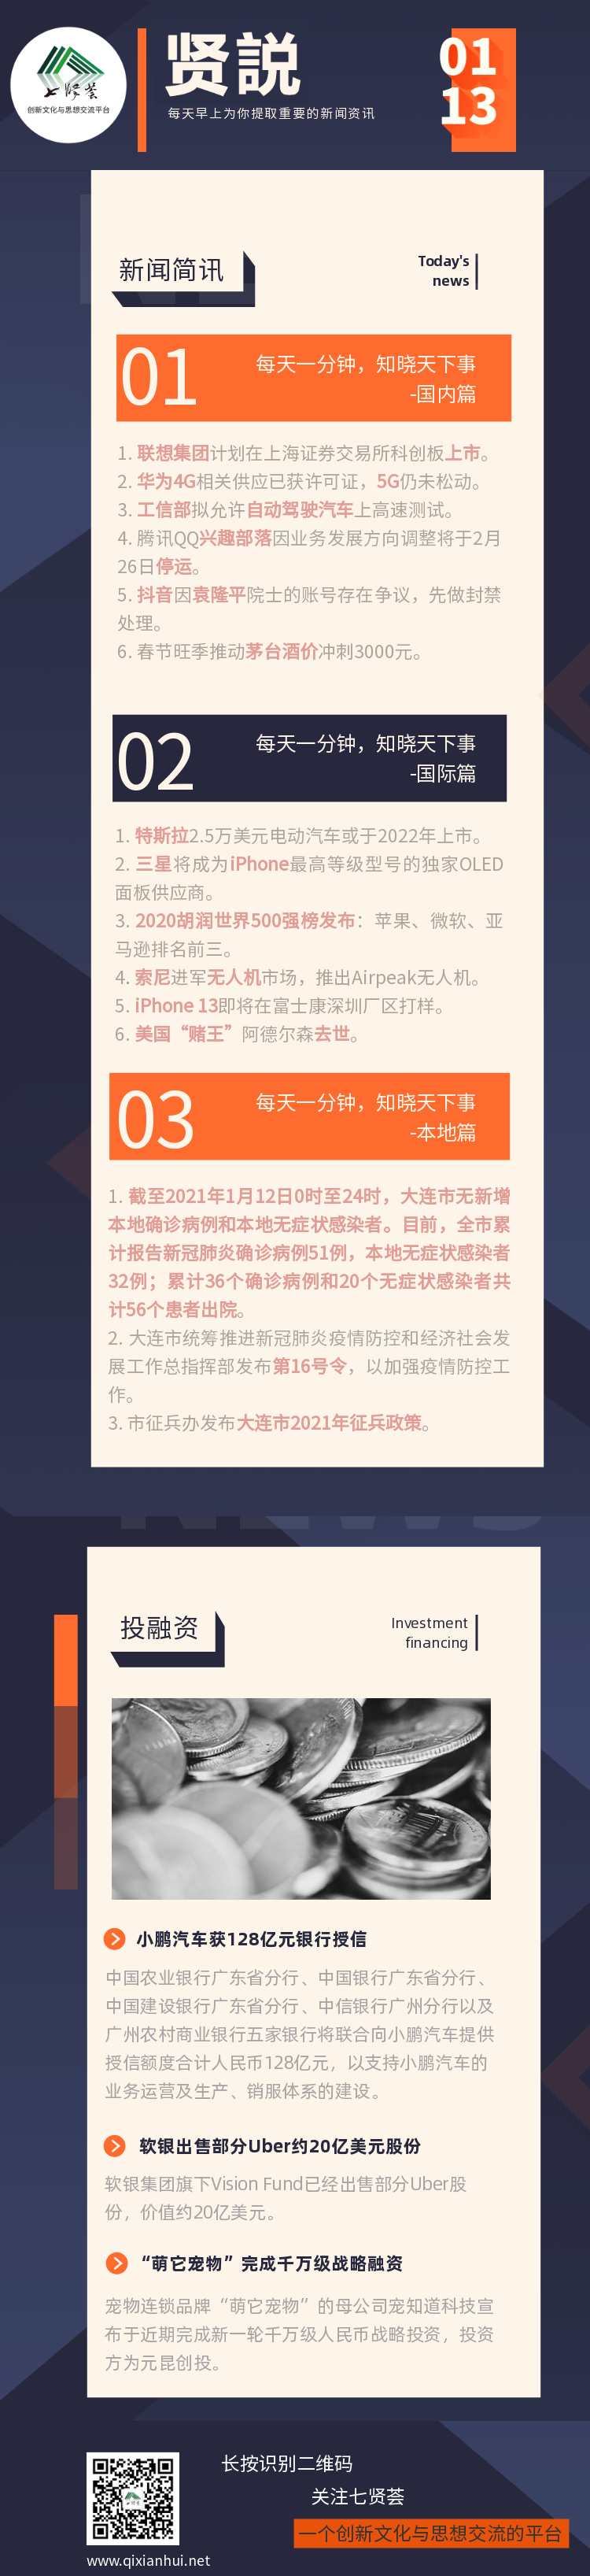 贤説-1.13-.png